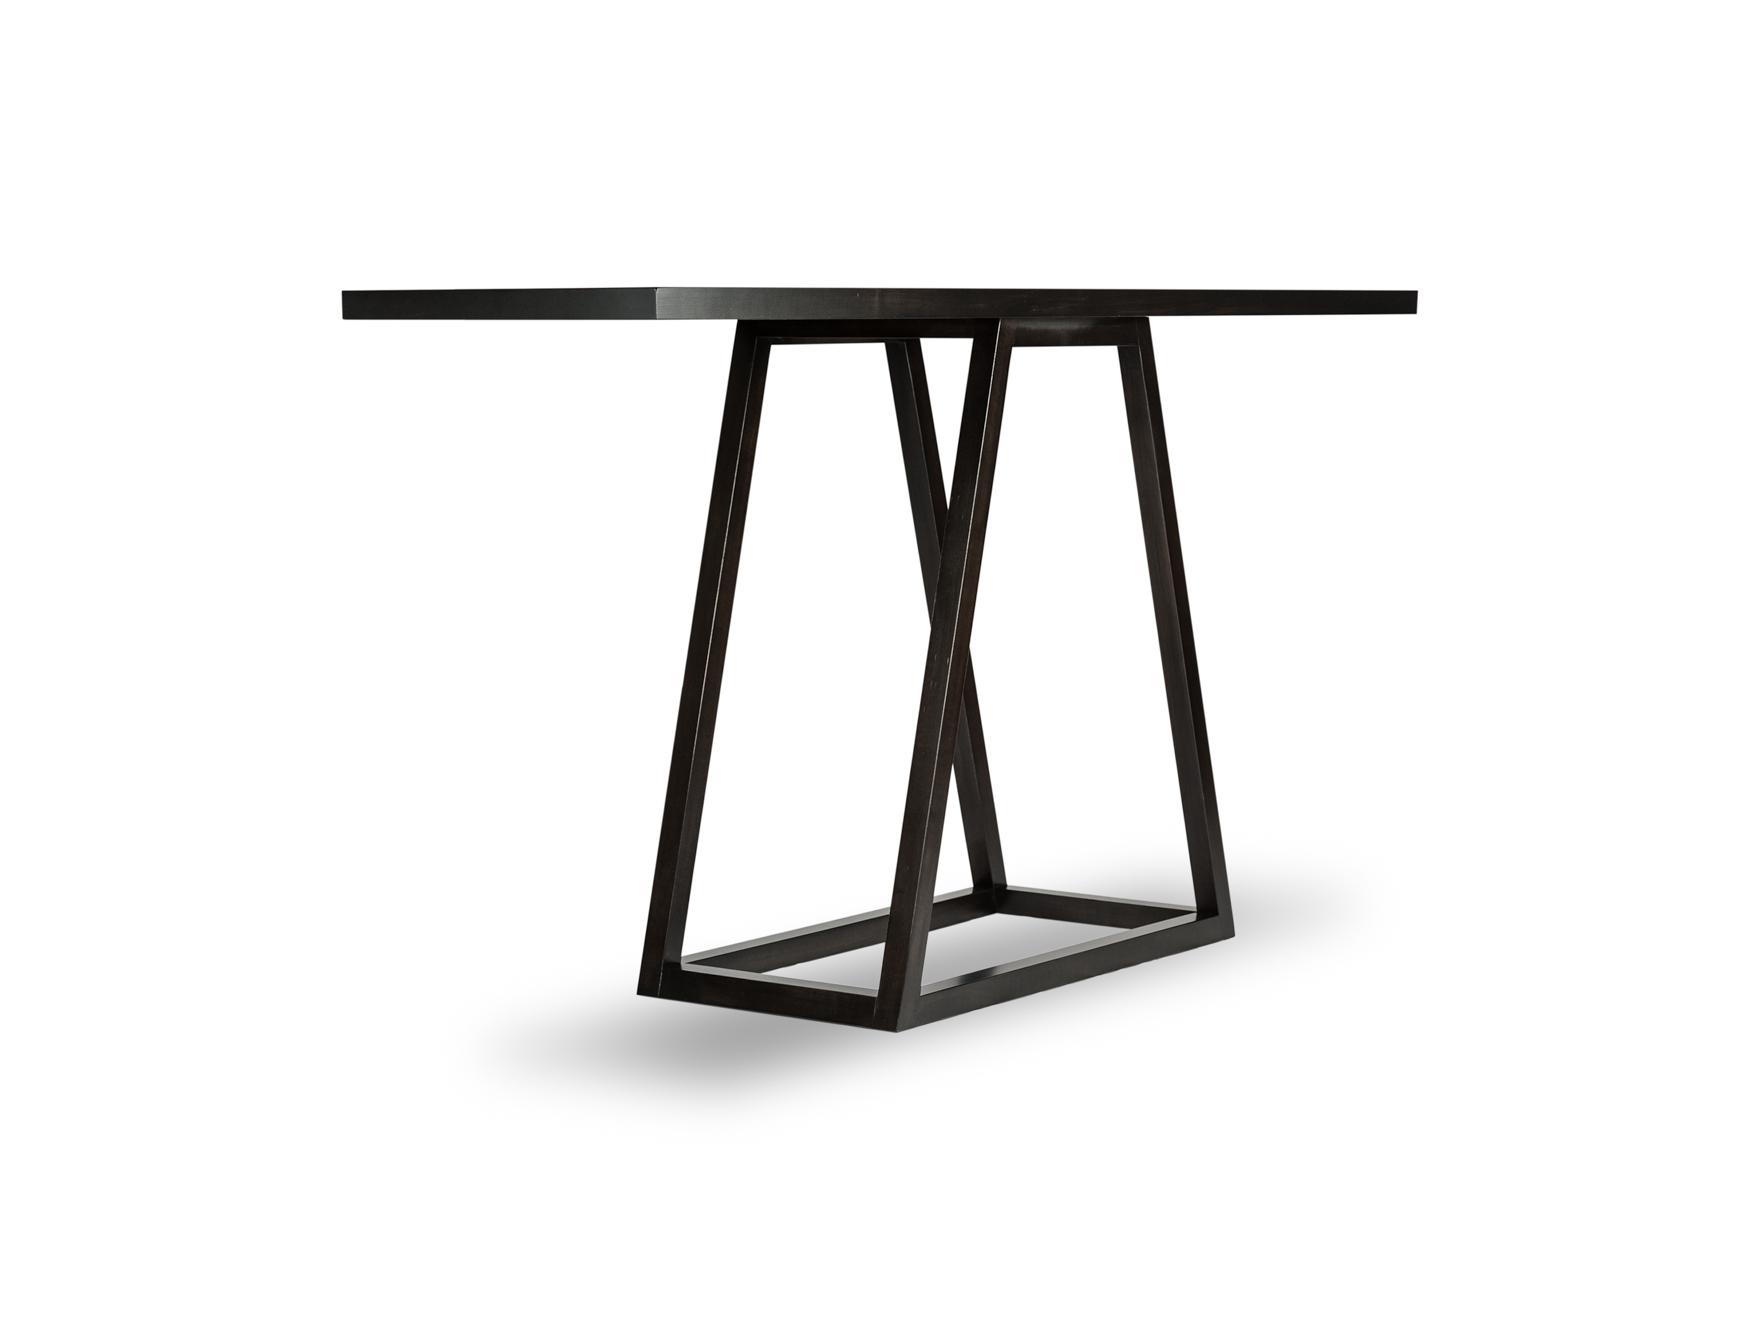 005_Woodcraft_Furniture_AvenueSofaTable_QtrA.jpg